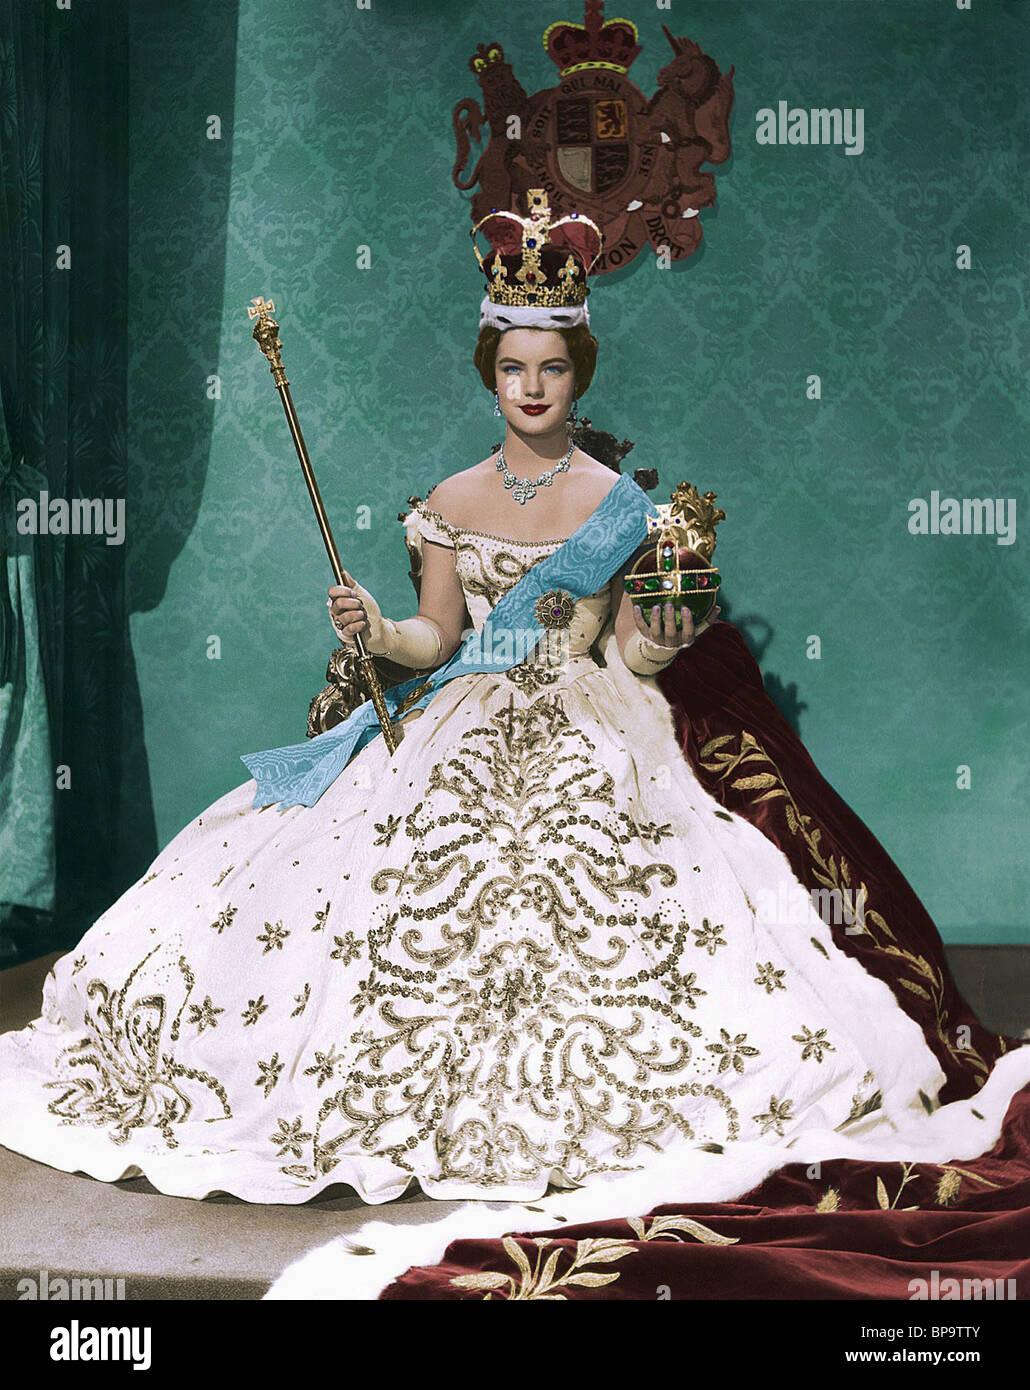 ROMY SCHNEIDER SISSI: EMPRESS ELISABETH (1957) - Stock Image